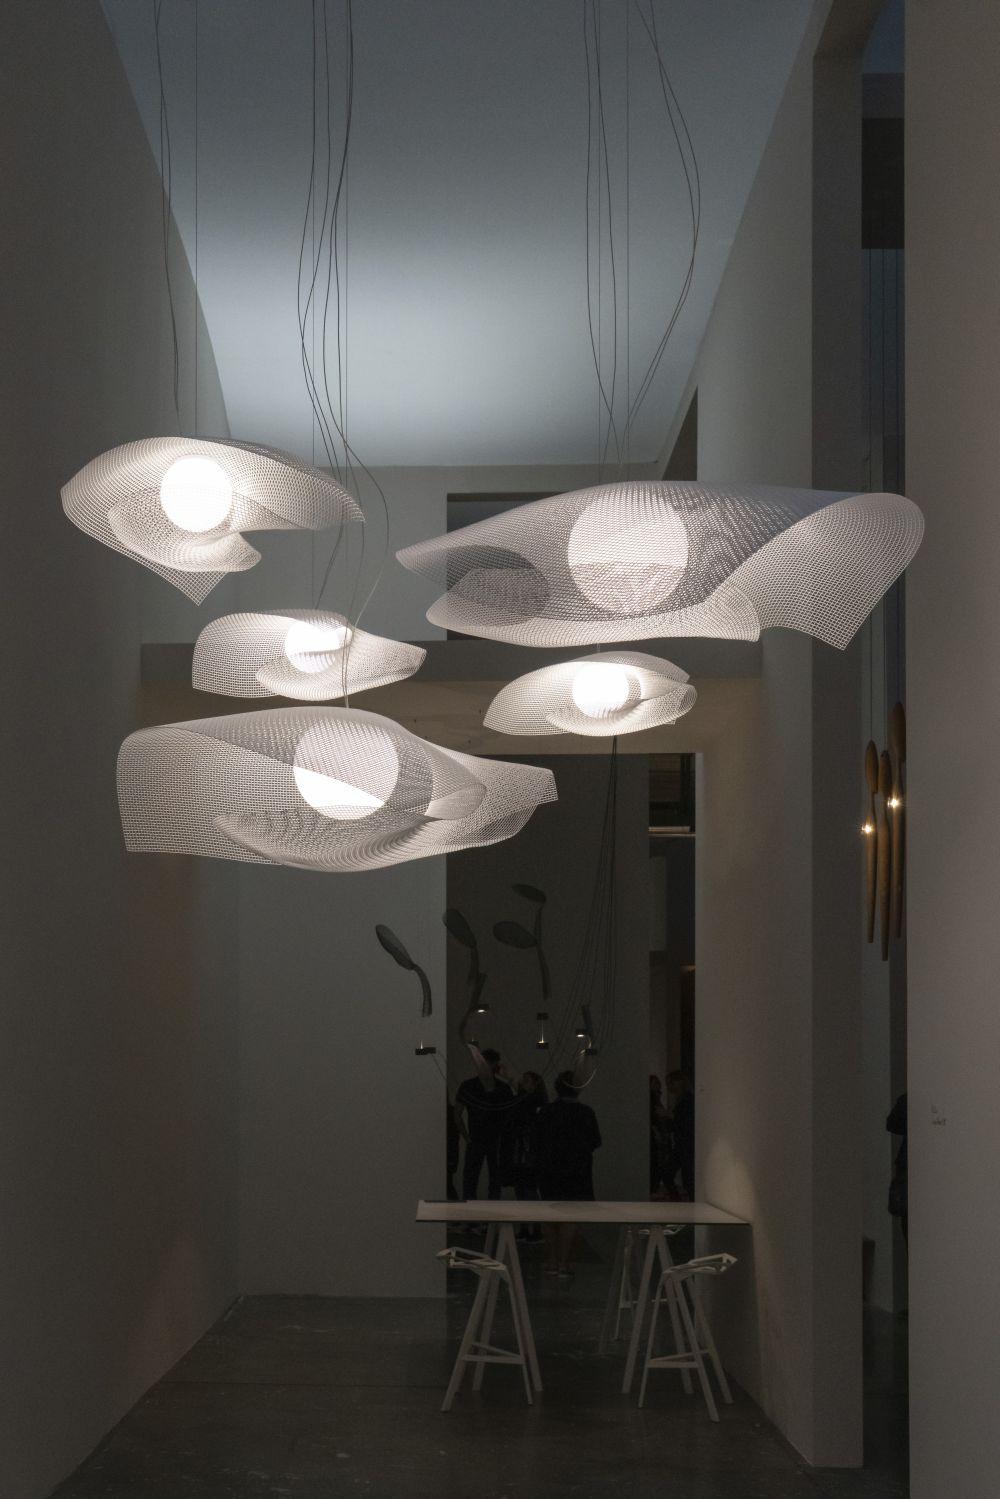 Unique Lighting Fixtures That Inspire Us